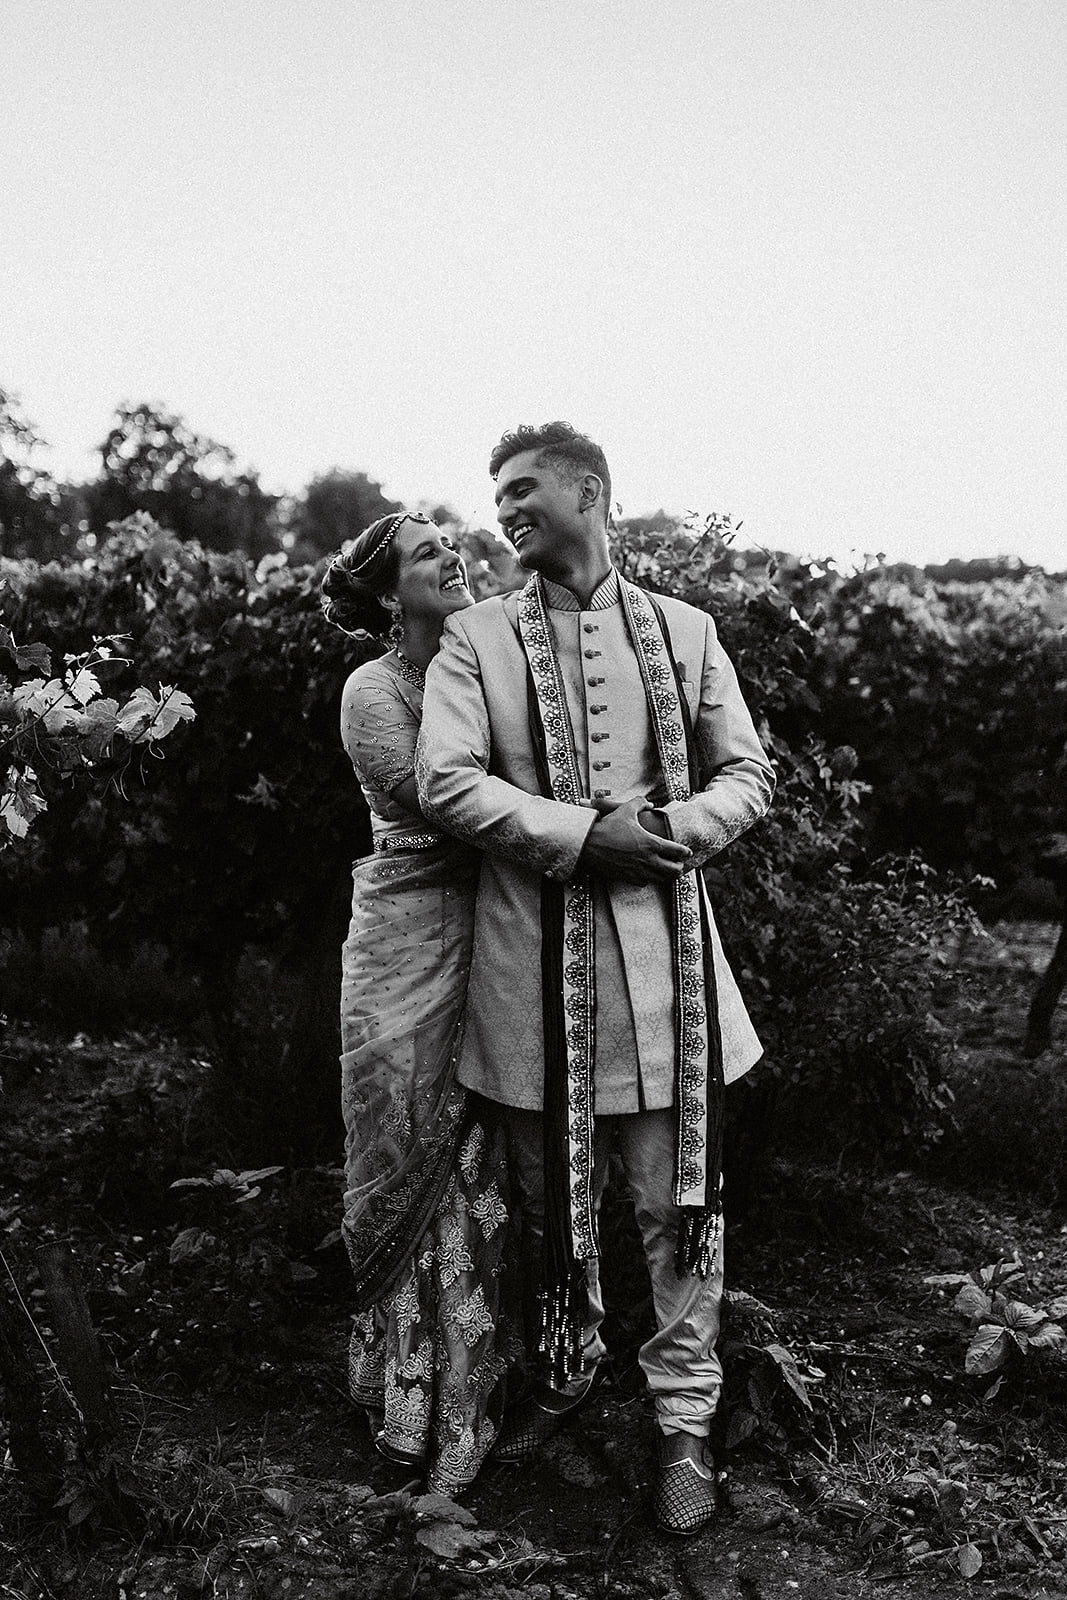 Mariage indien en France